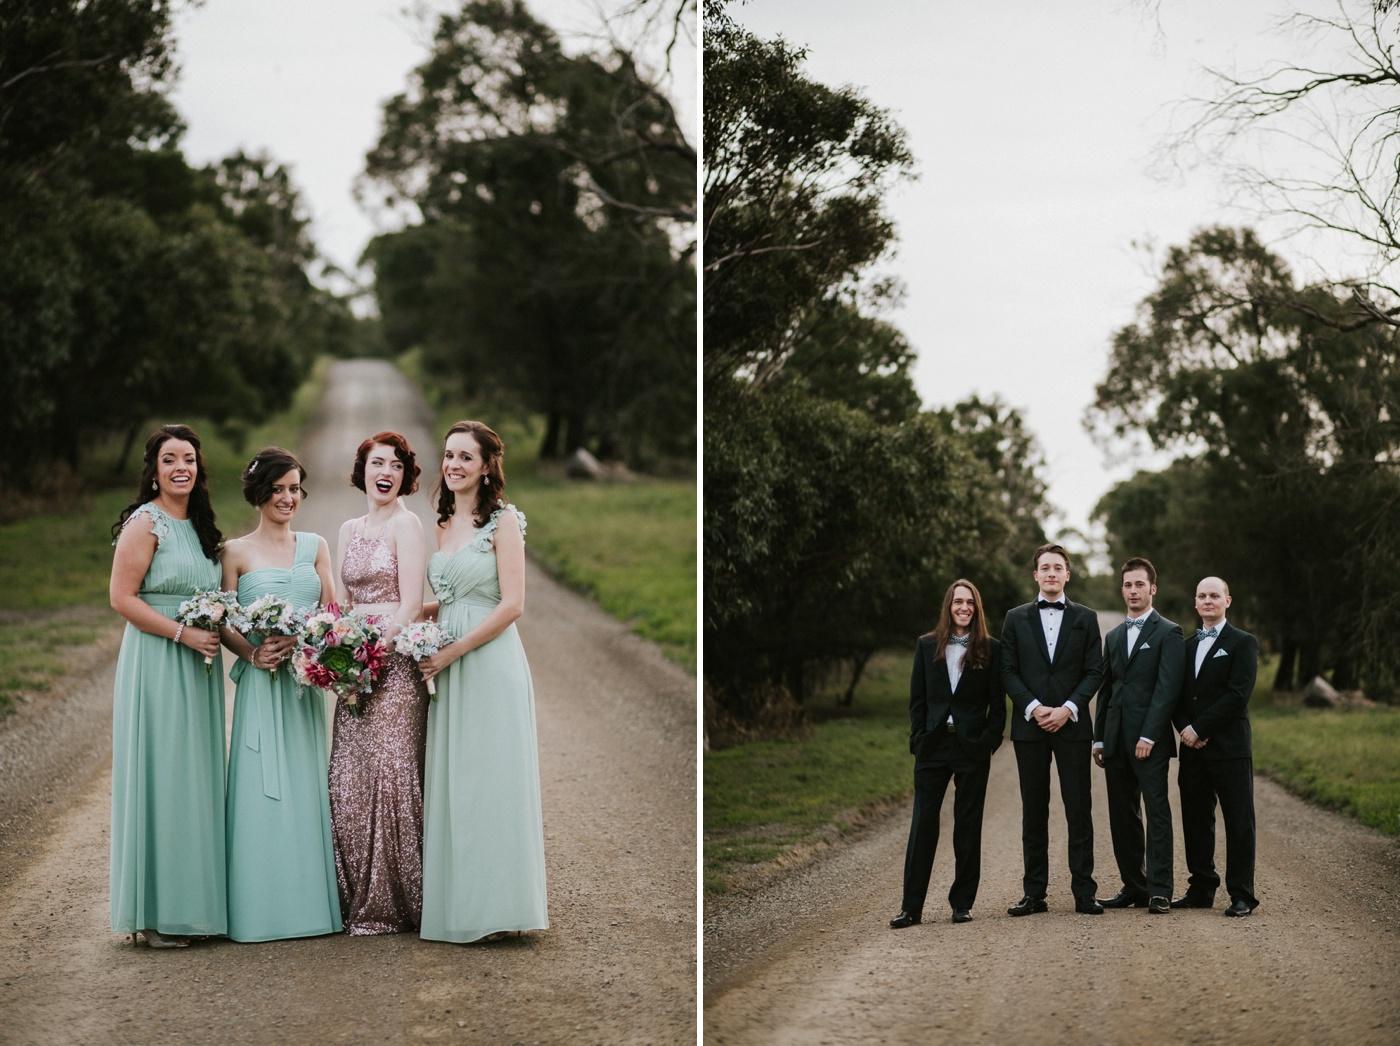 Emma&Morgan_Melbourne-Vintage-Elegant-Fun-Quirky-Yarra-Valley-Vineyard-Wedding_Melbourne-Wedding-Photography-68